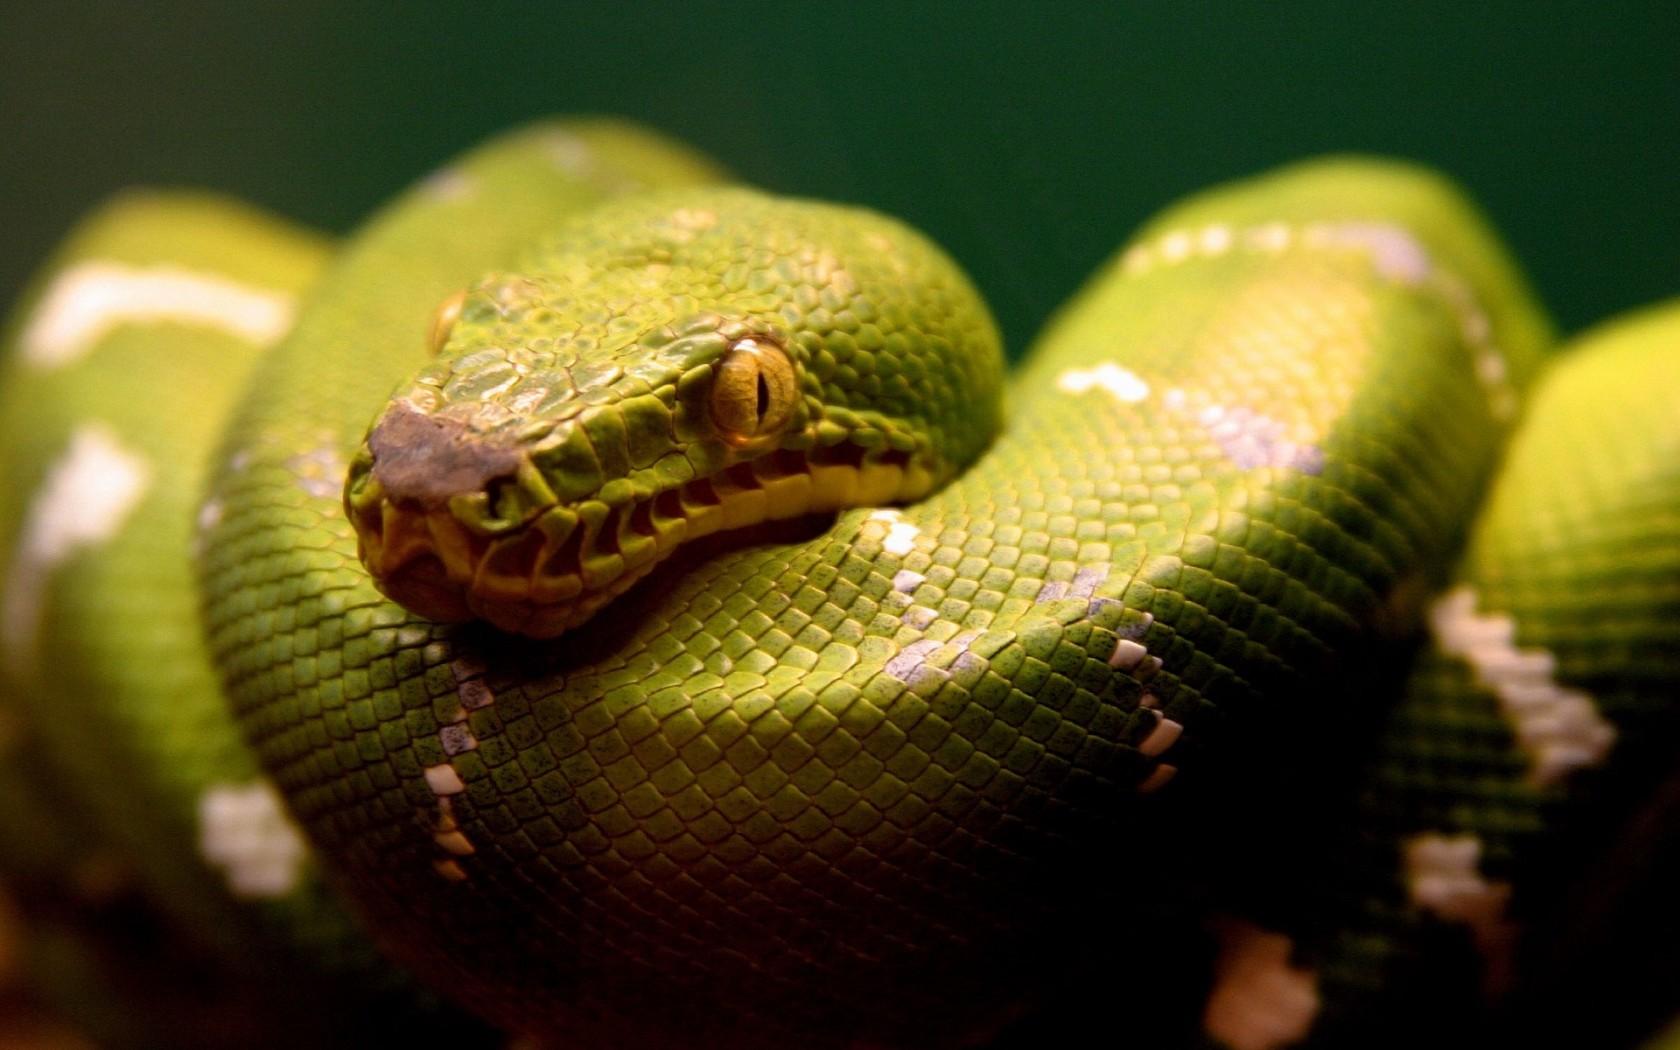 Cute Snake Hd Wallpaper A Green Snake Wallpapers Hd Wallpapers Id 5045